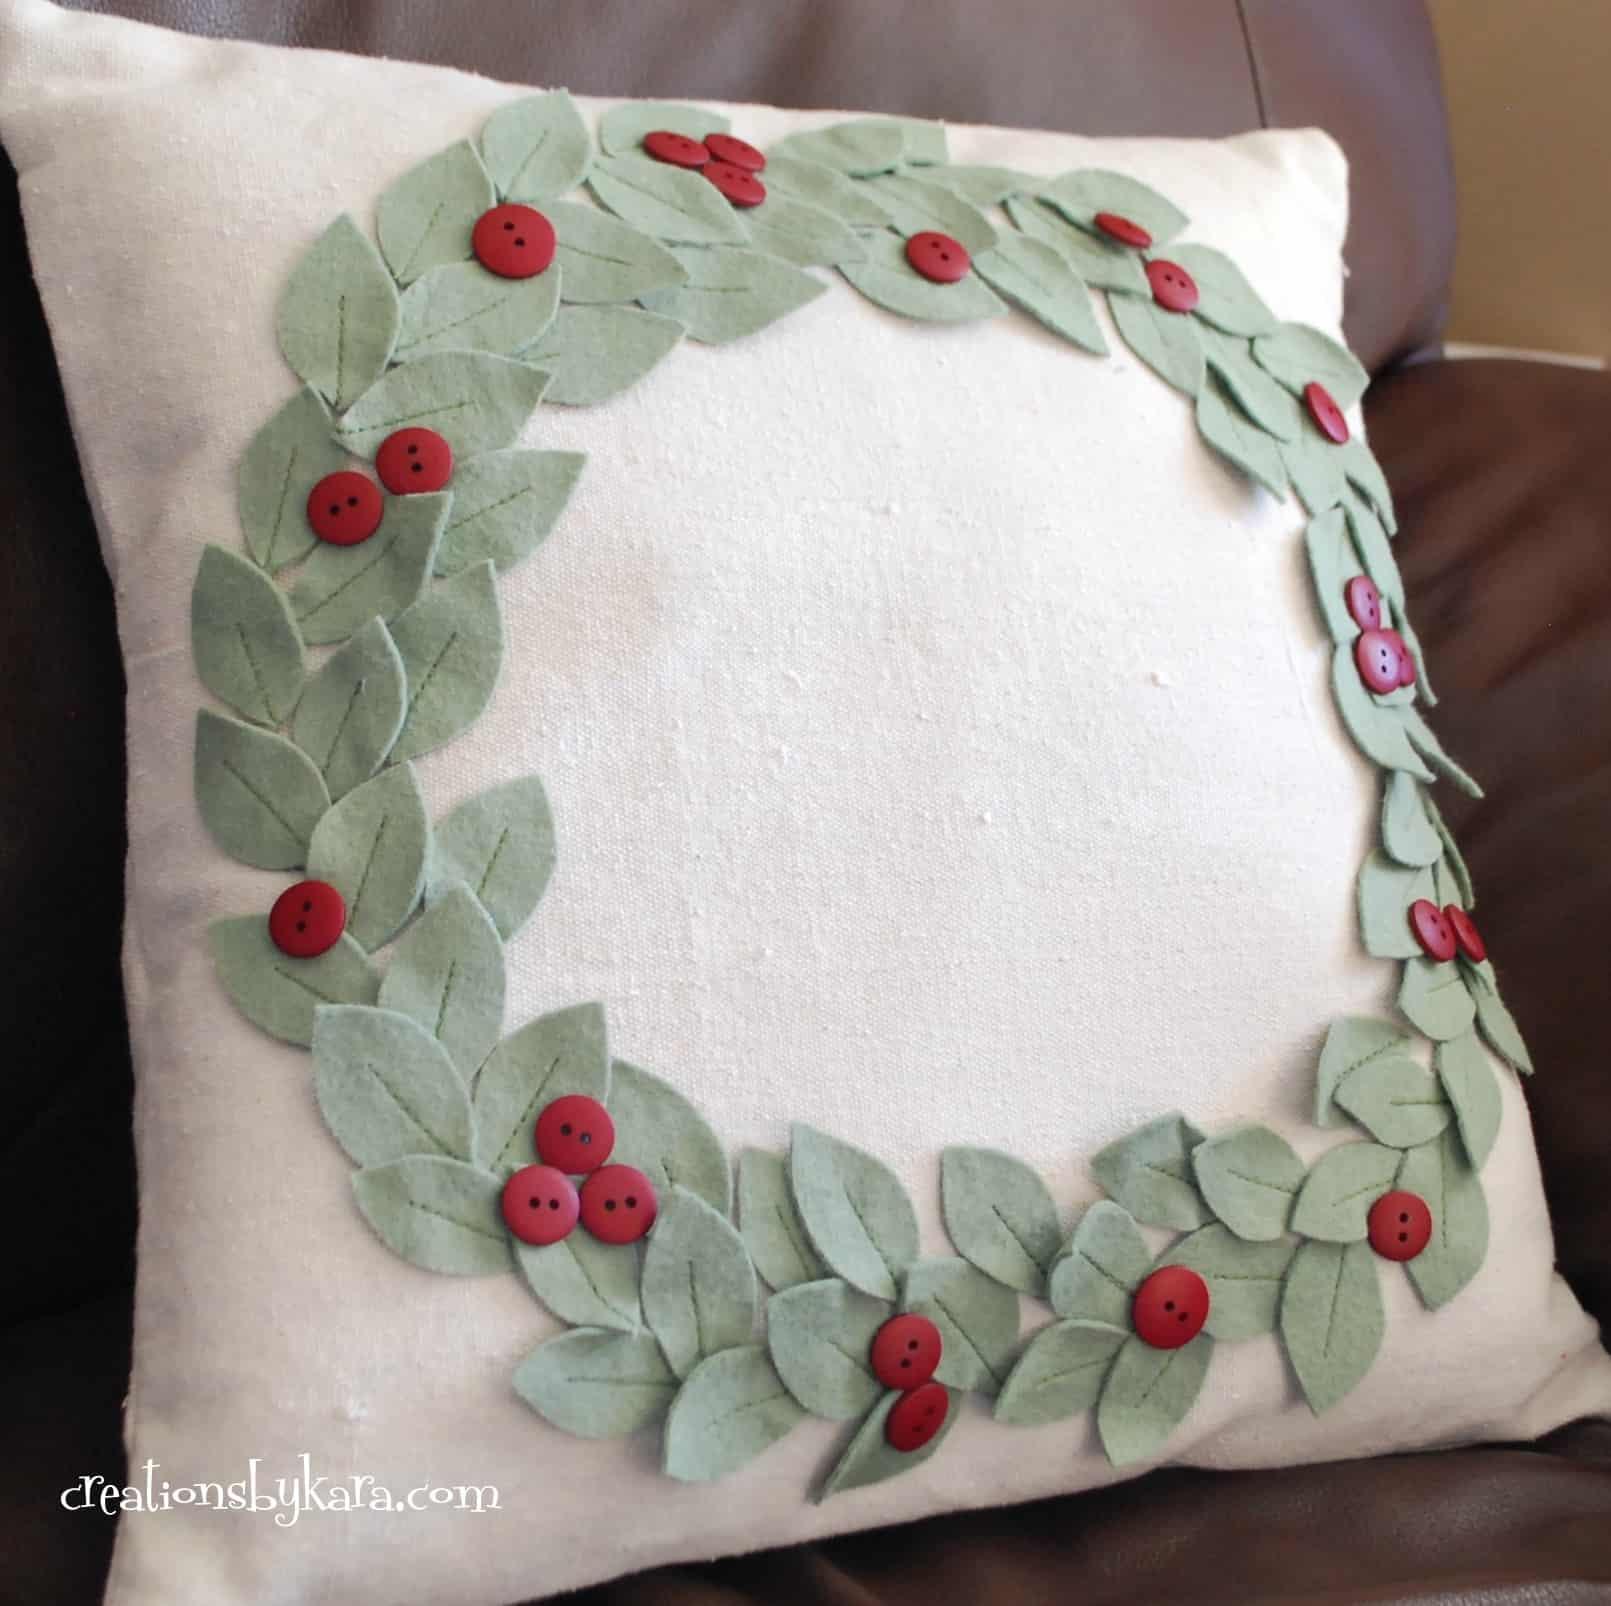 Pottery Barn Knock Off Christmas Pillow Creations By Kara